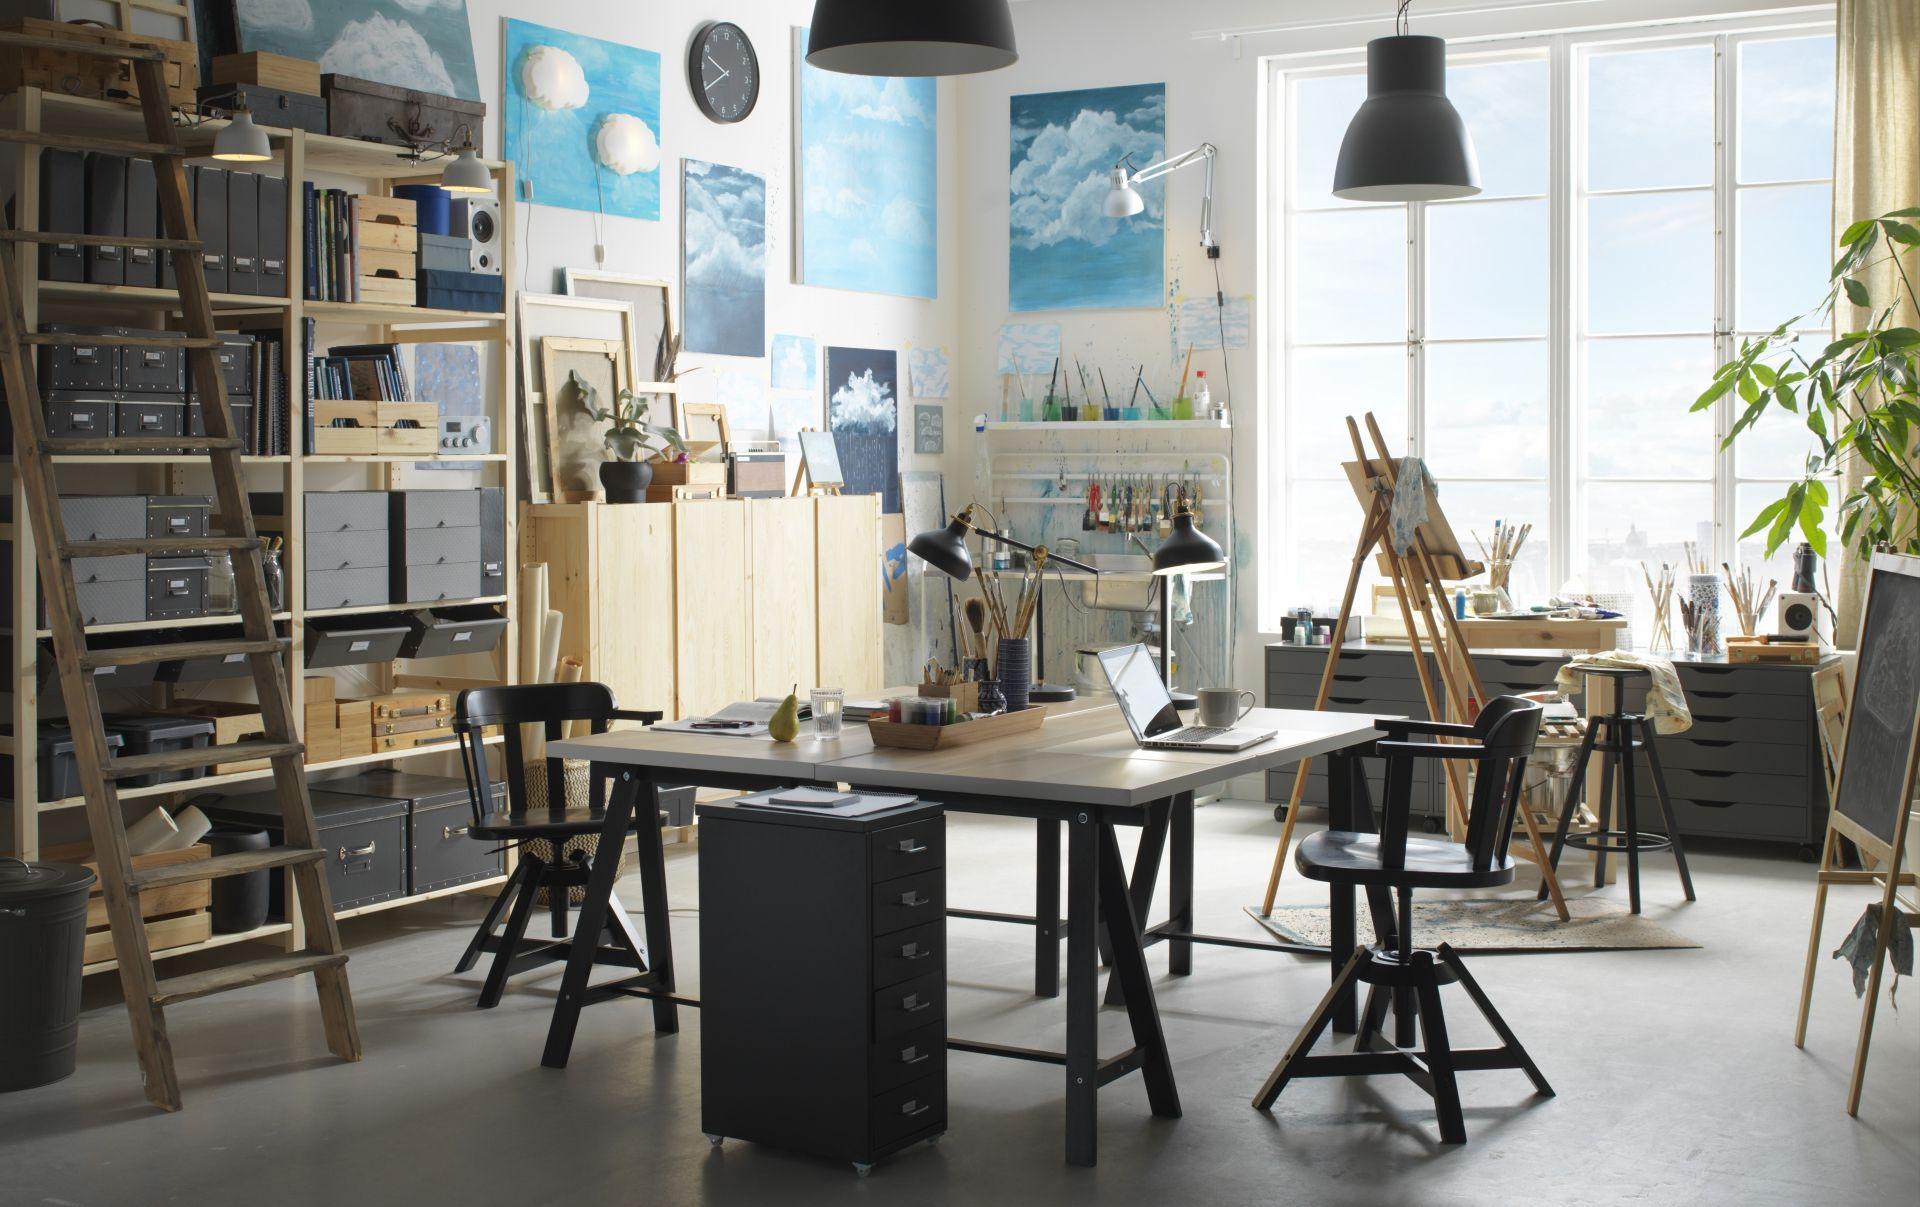 Bureaustoel Ikea Zwart : Feodor bureaustoel ikea ikeanl ikeanederland inspiratie